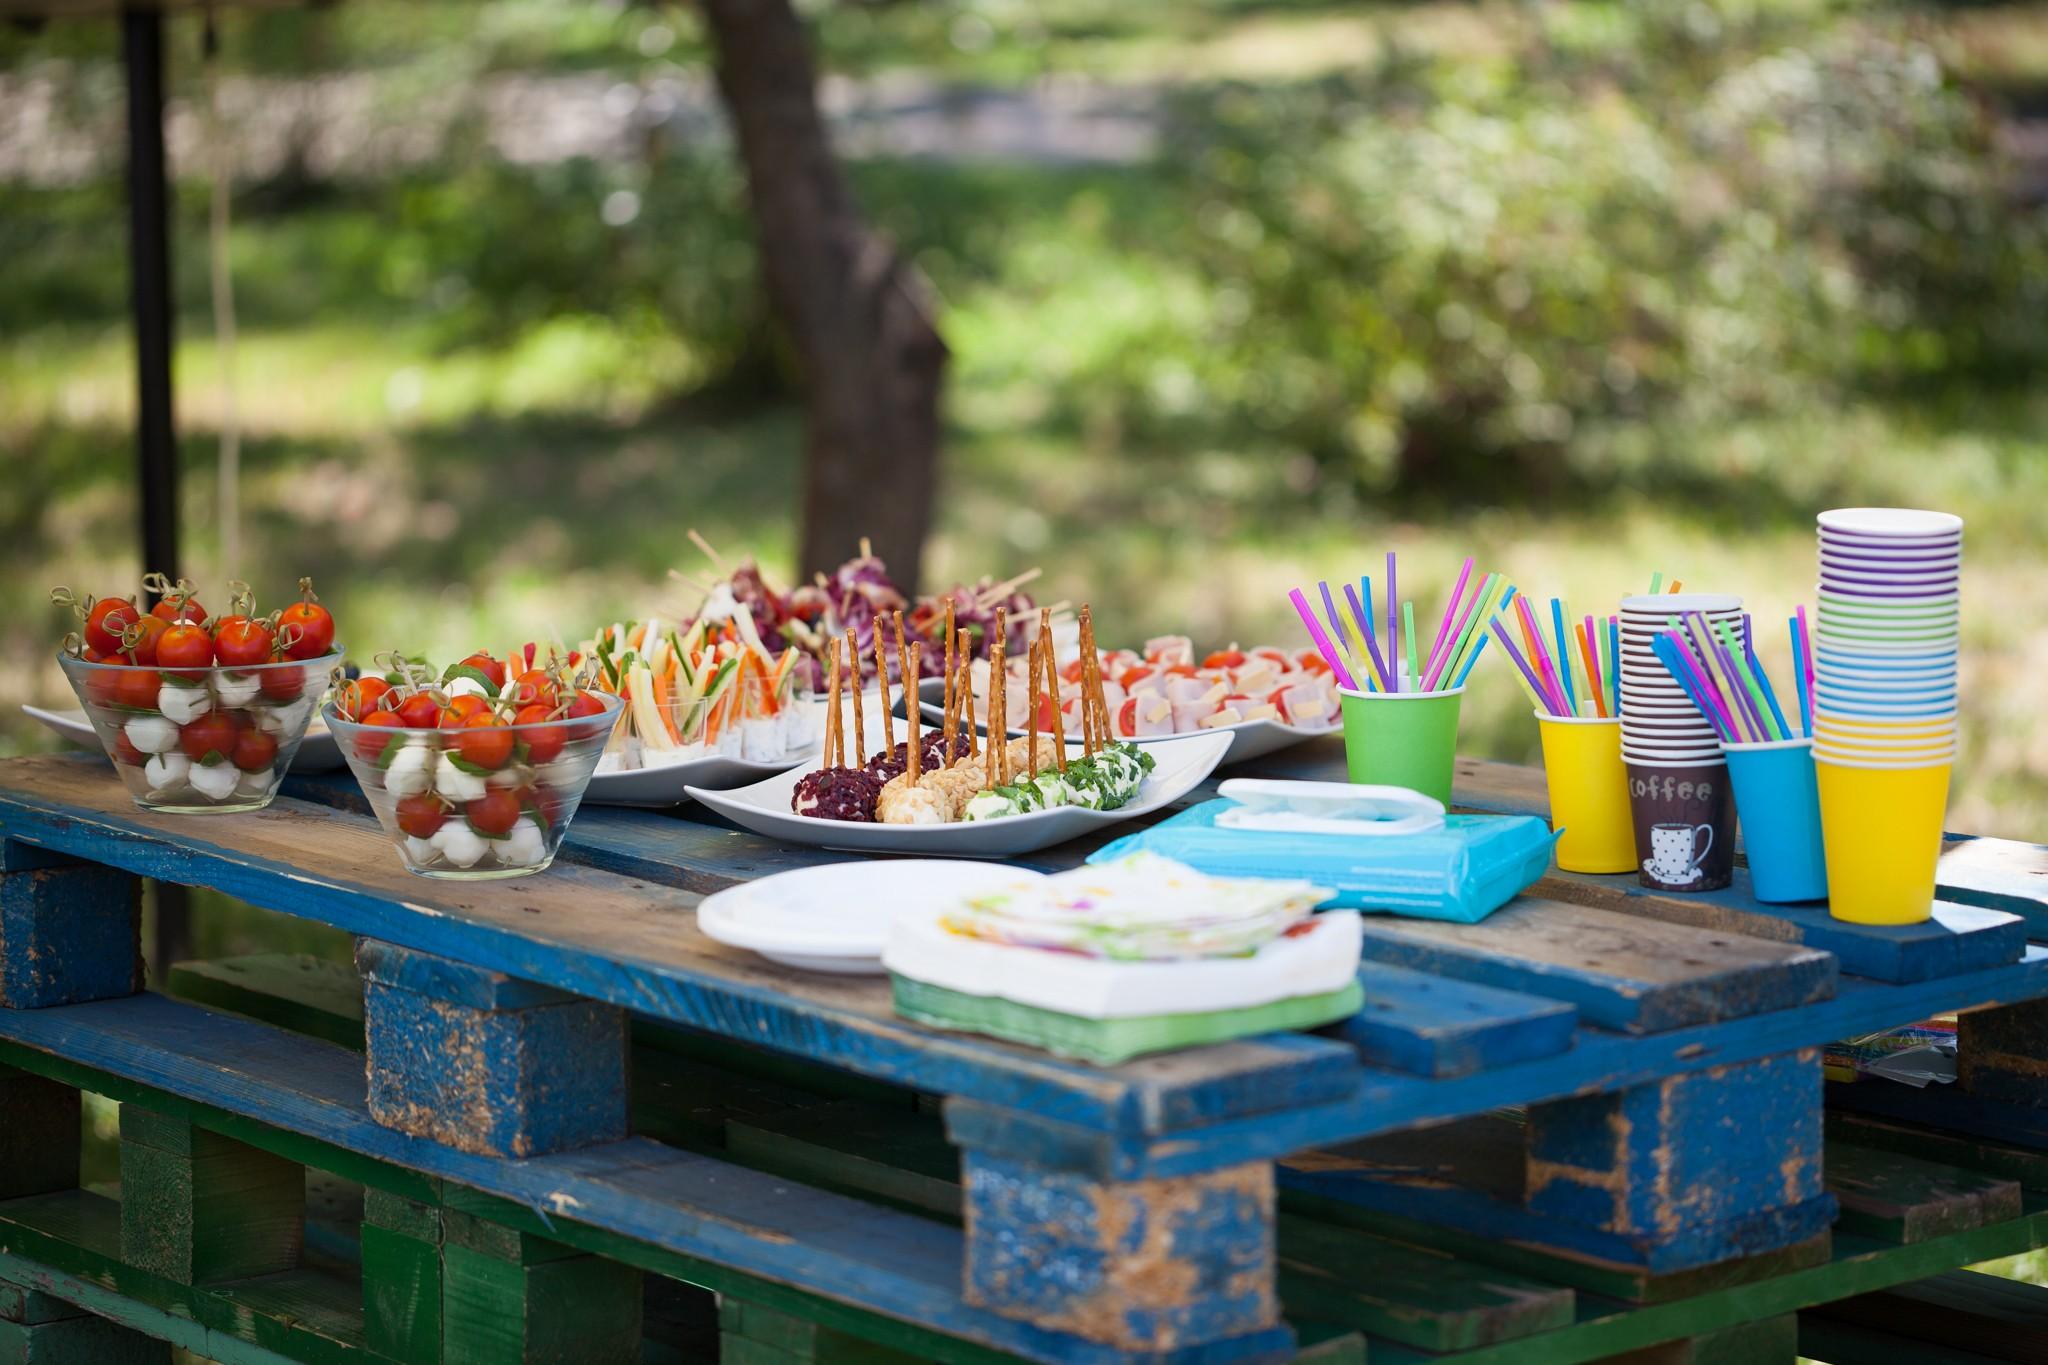 picnicool by daddycool